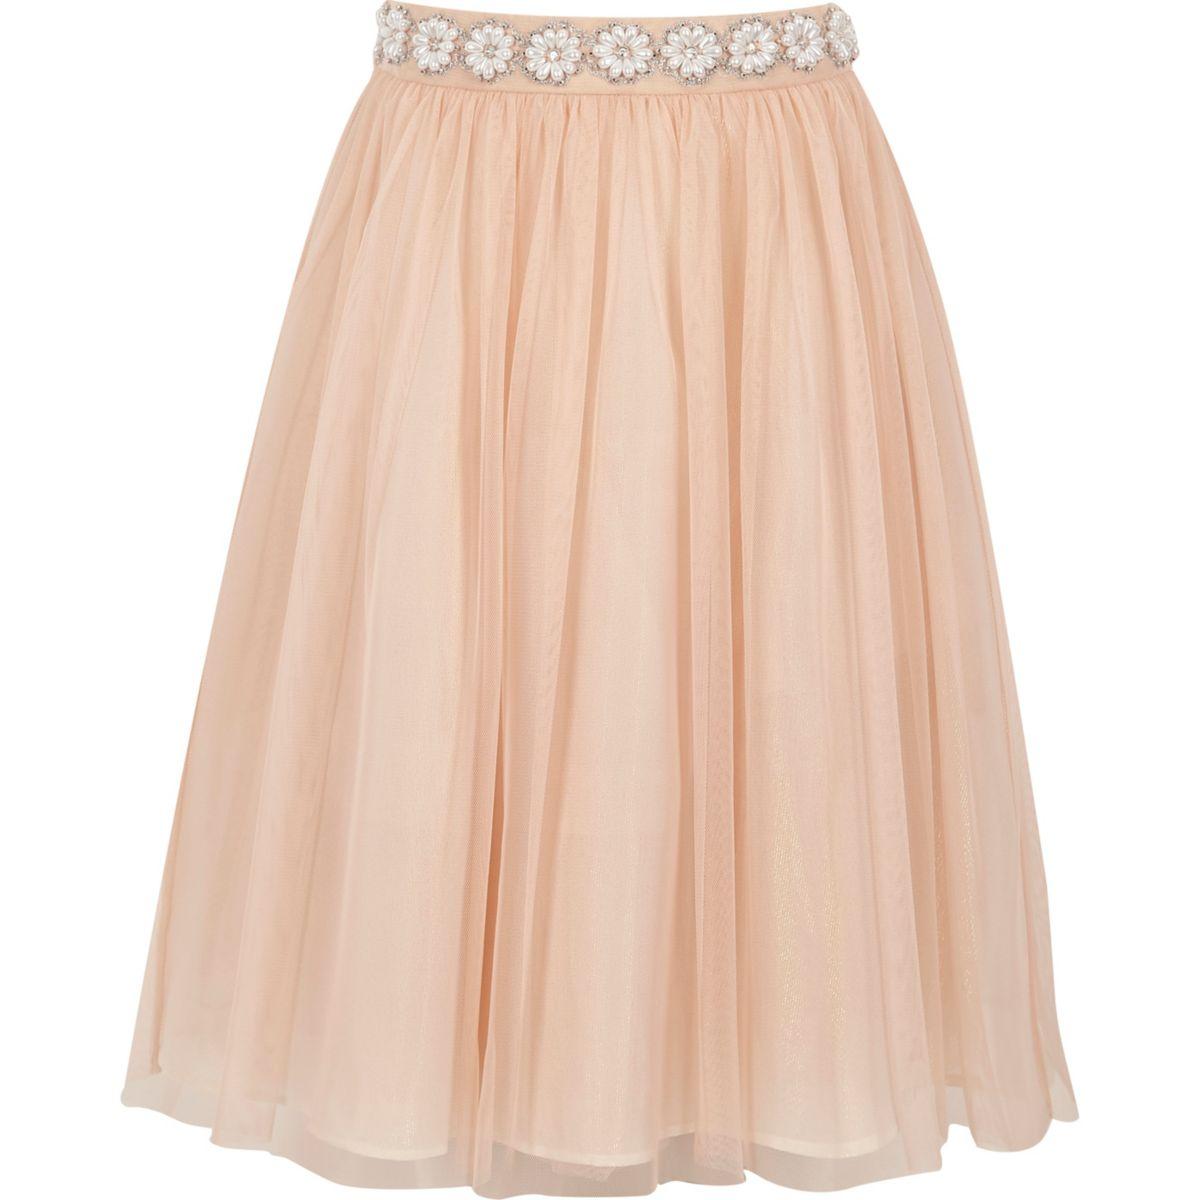 Girls pink pearl trim mesh ballerina skirt